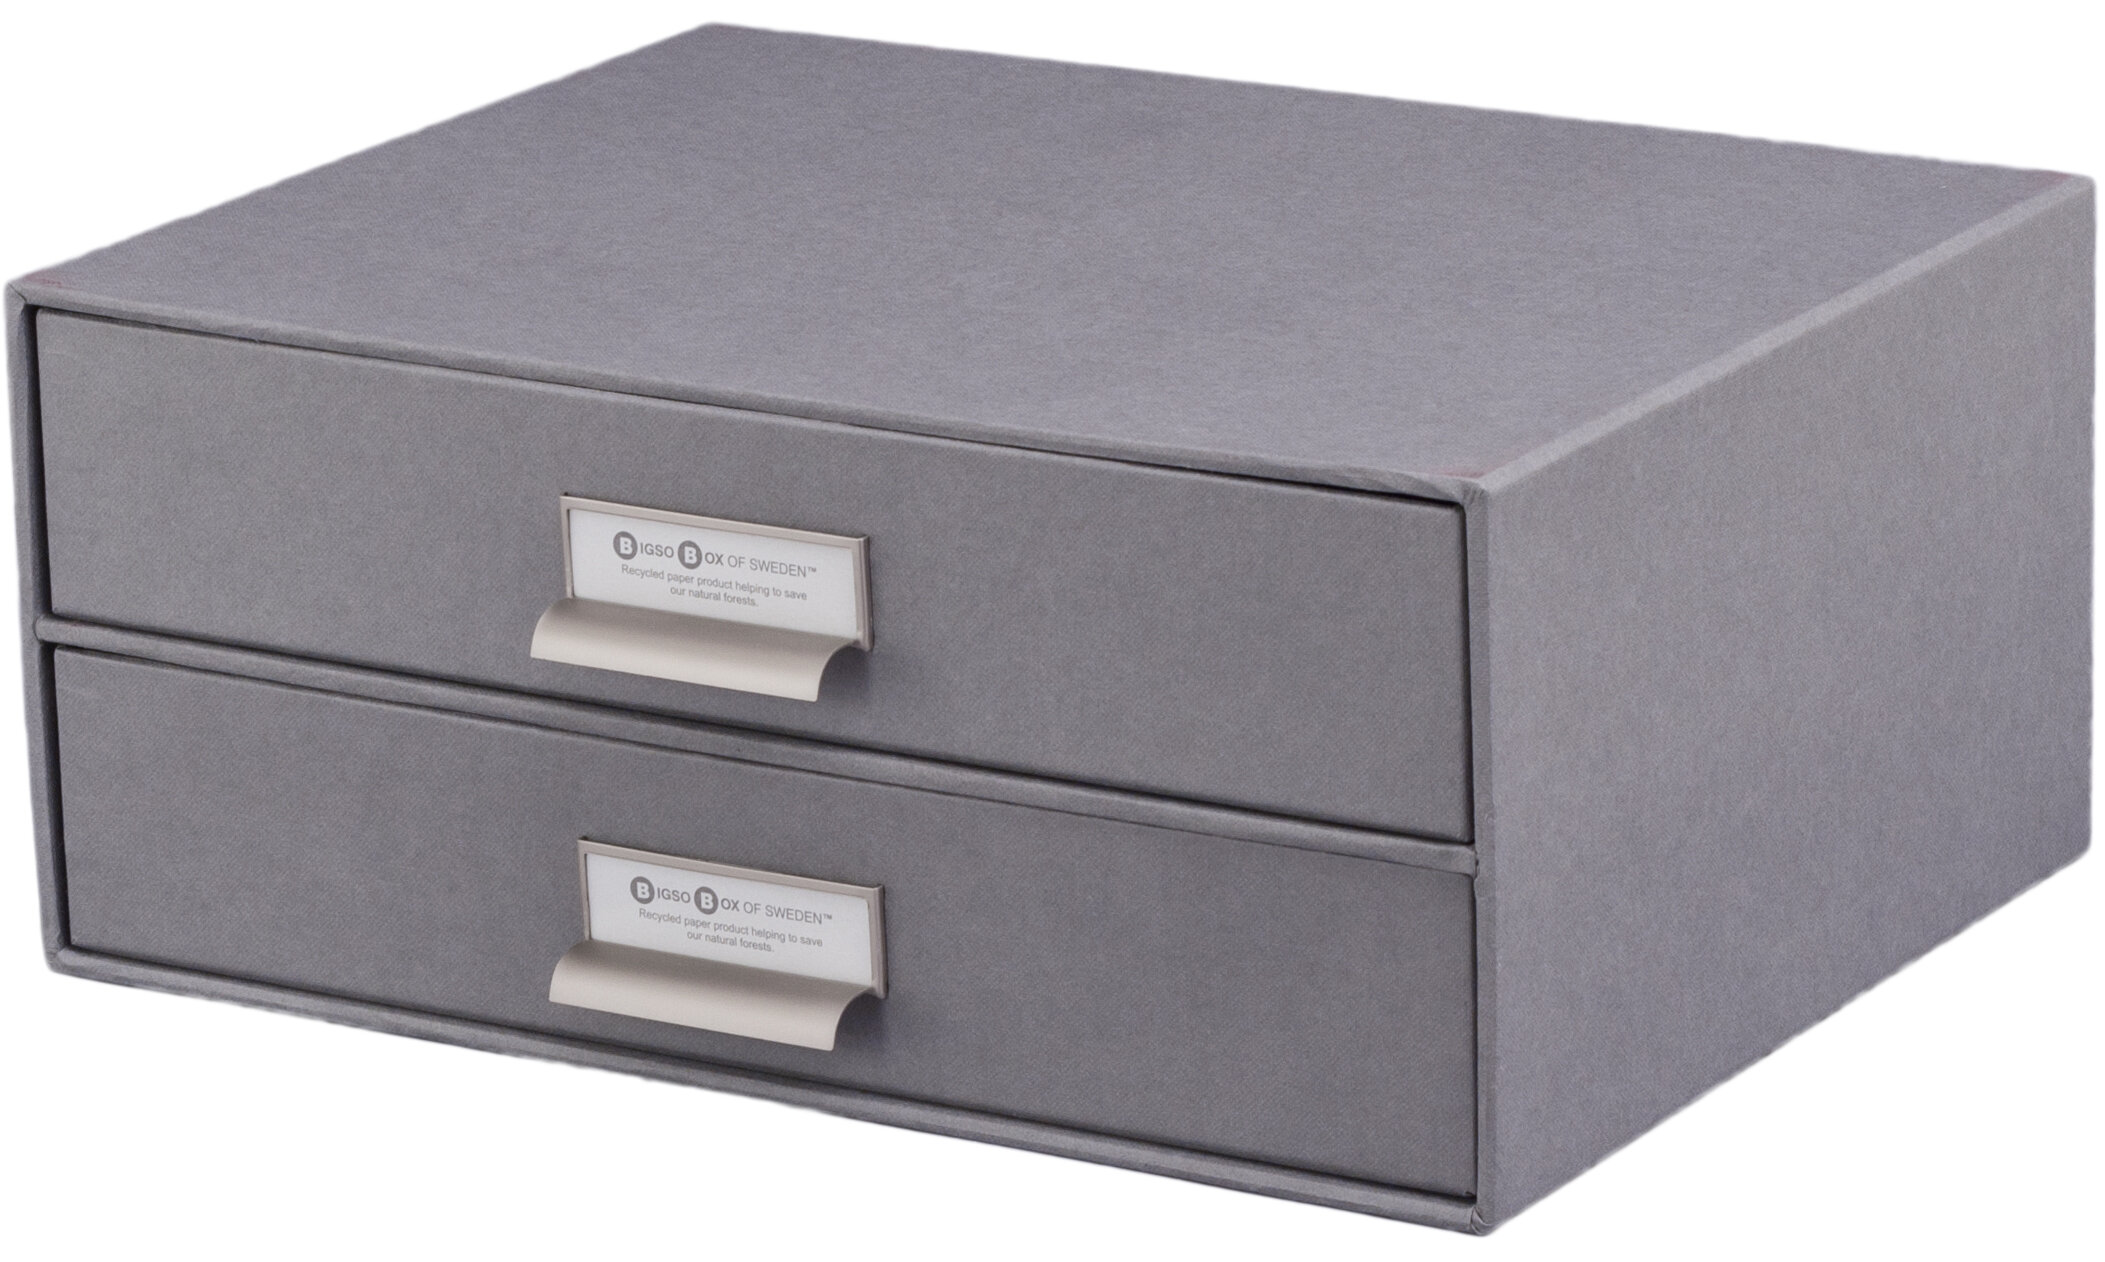 bigso birger 2 drawer paper file box & reviews | wayfair paper file box